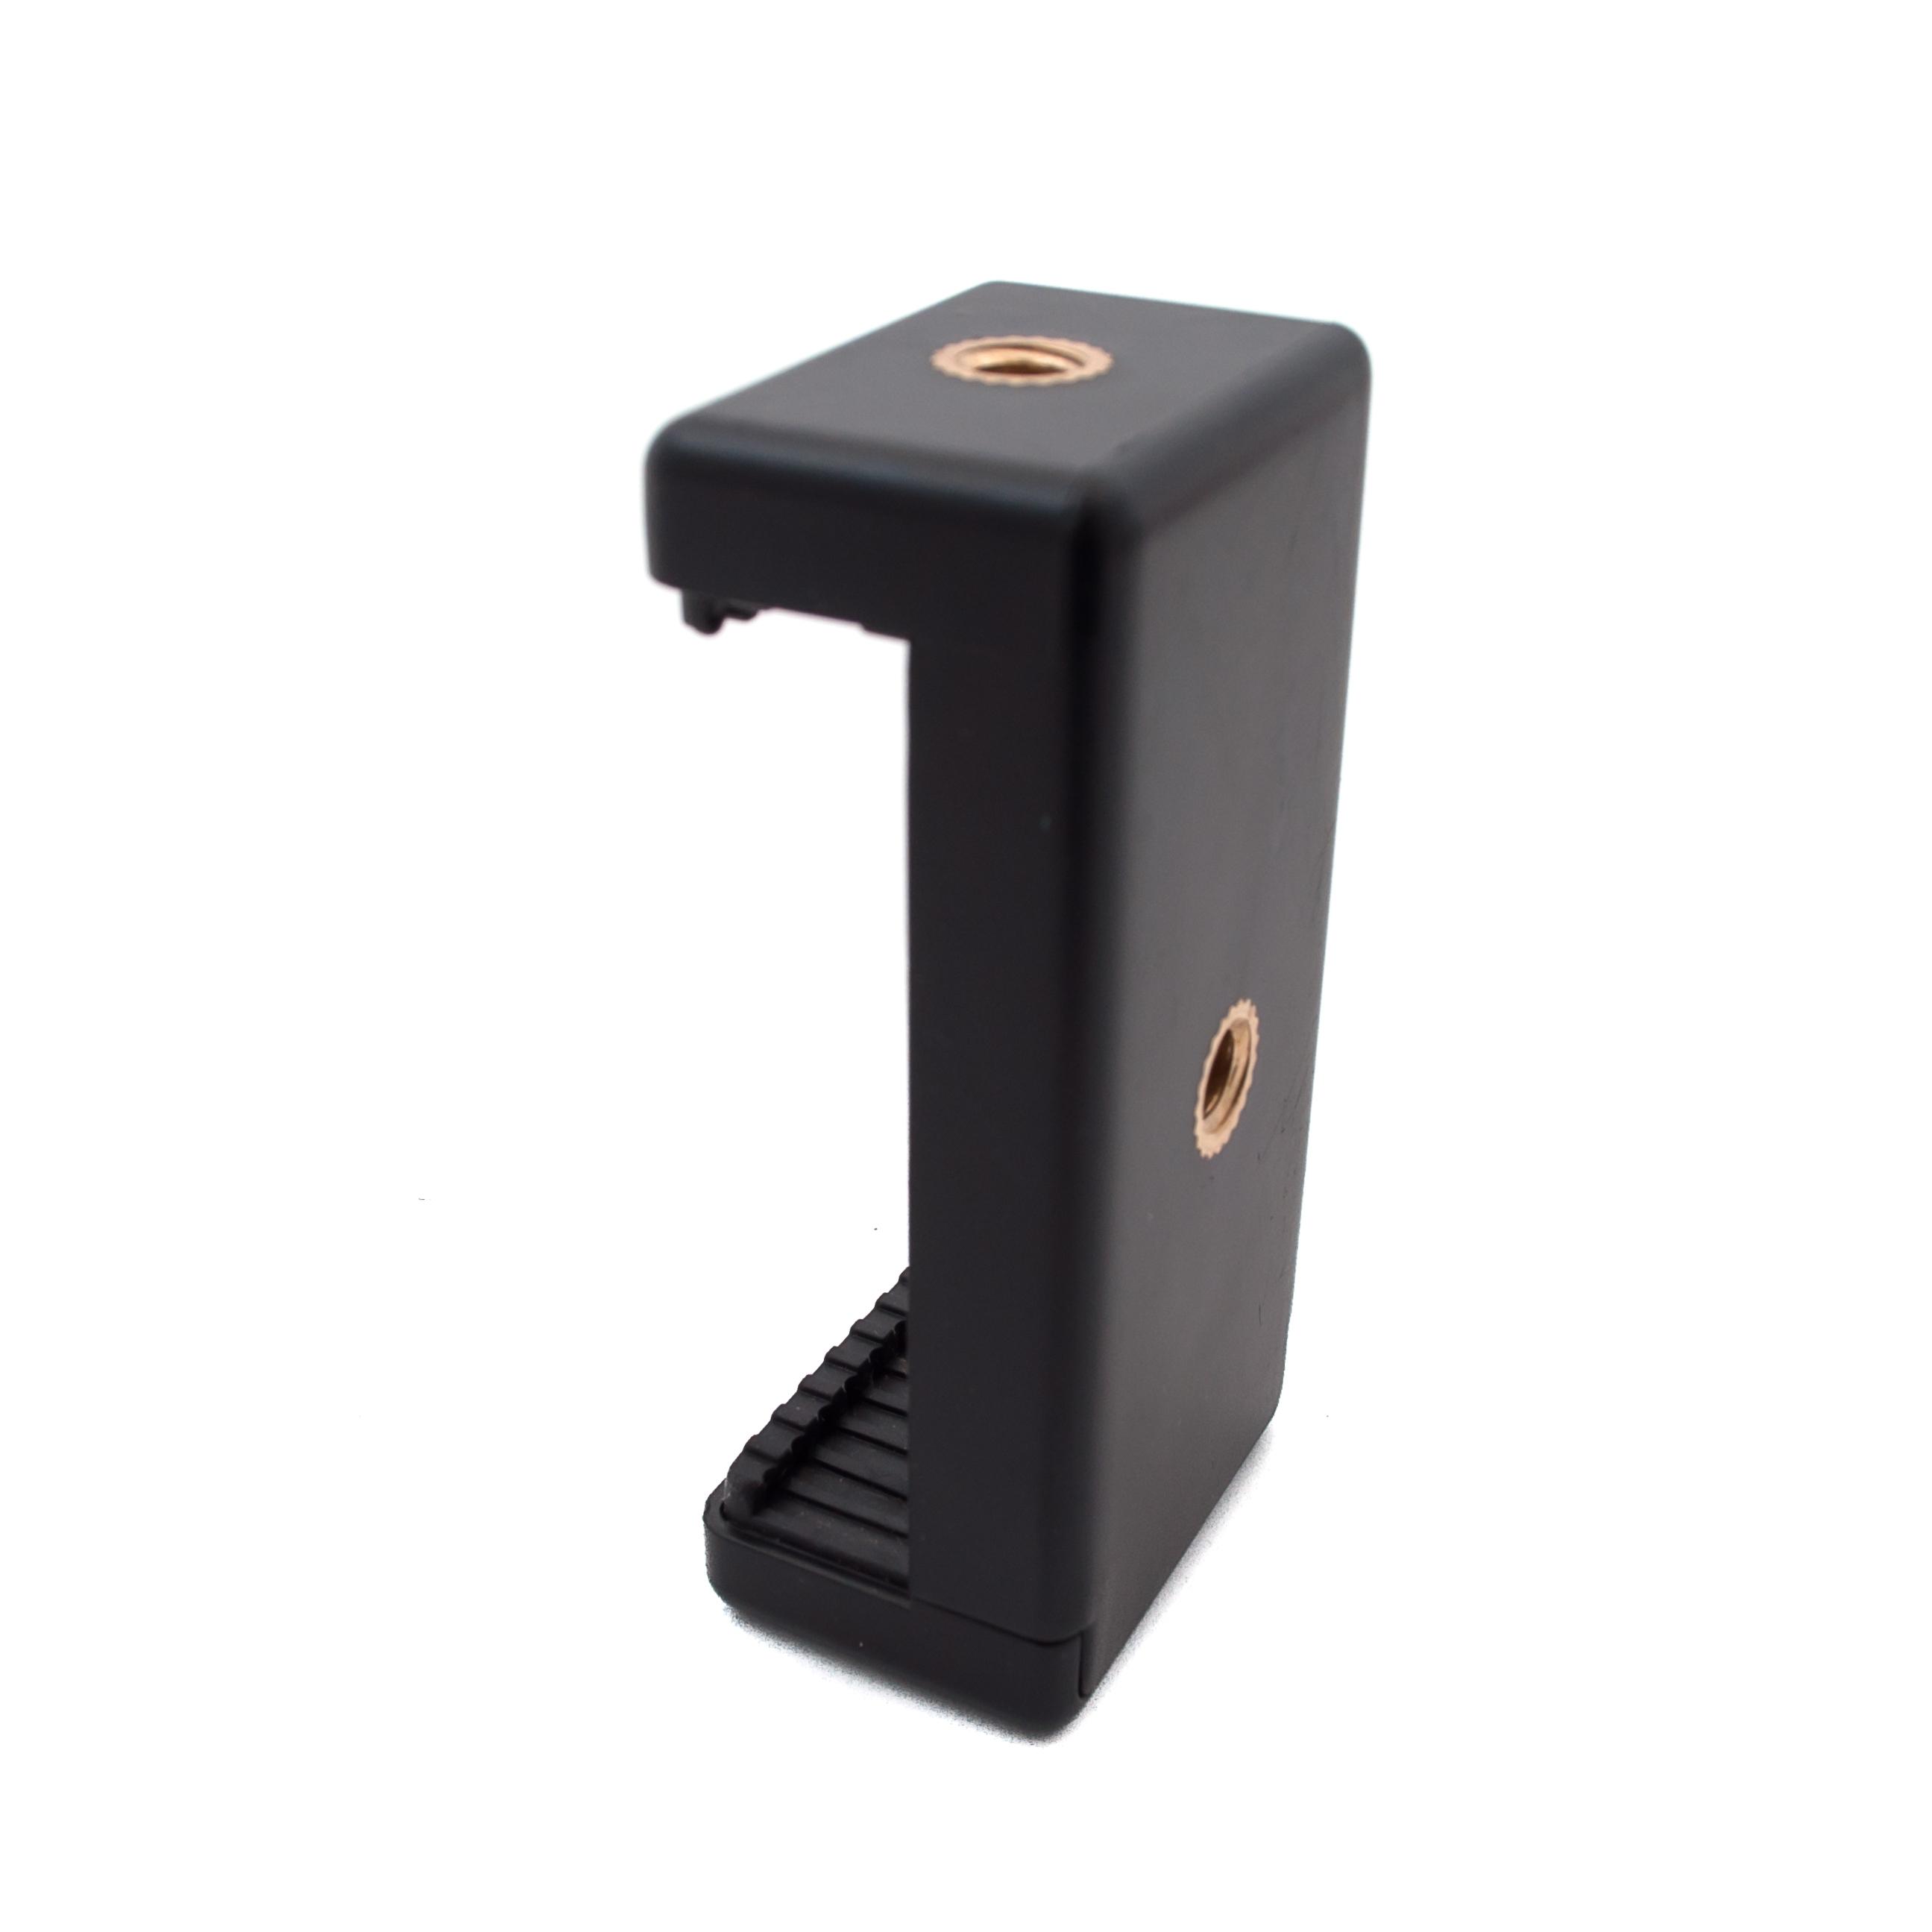 Держатель смартфона к коптеру для селфи spark аккумуляторная батарея mavic combo алиэкспресс